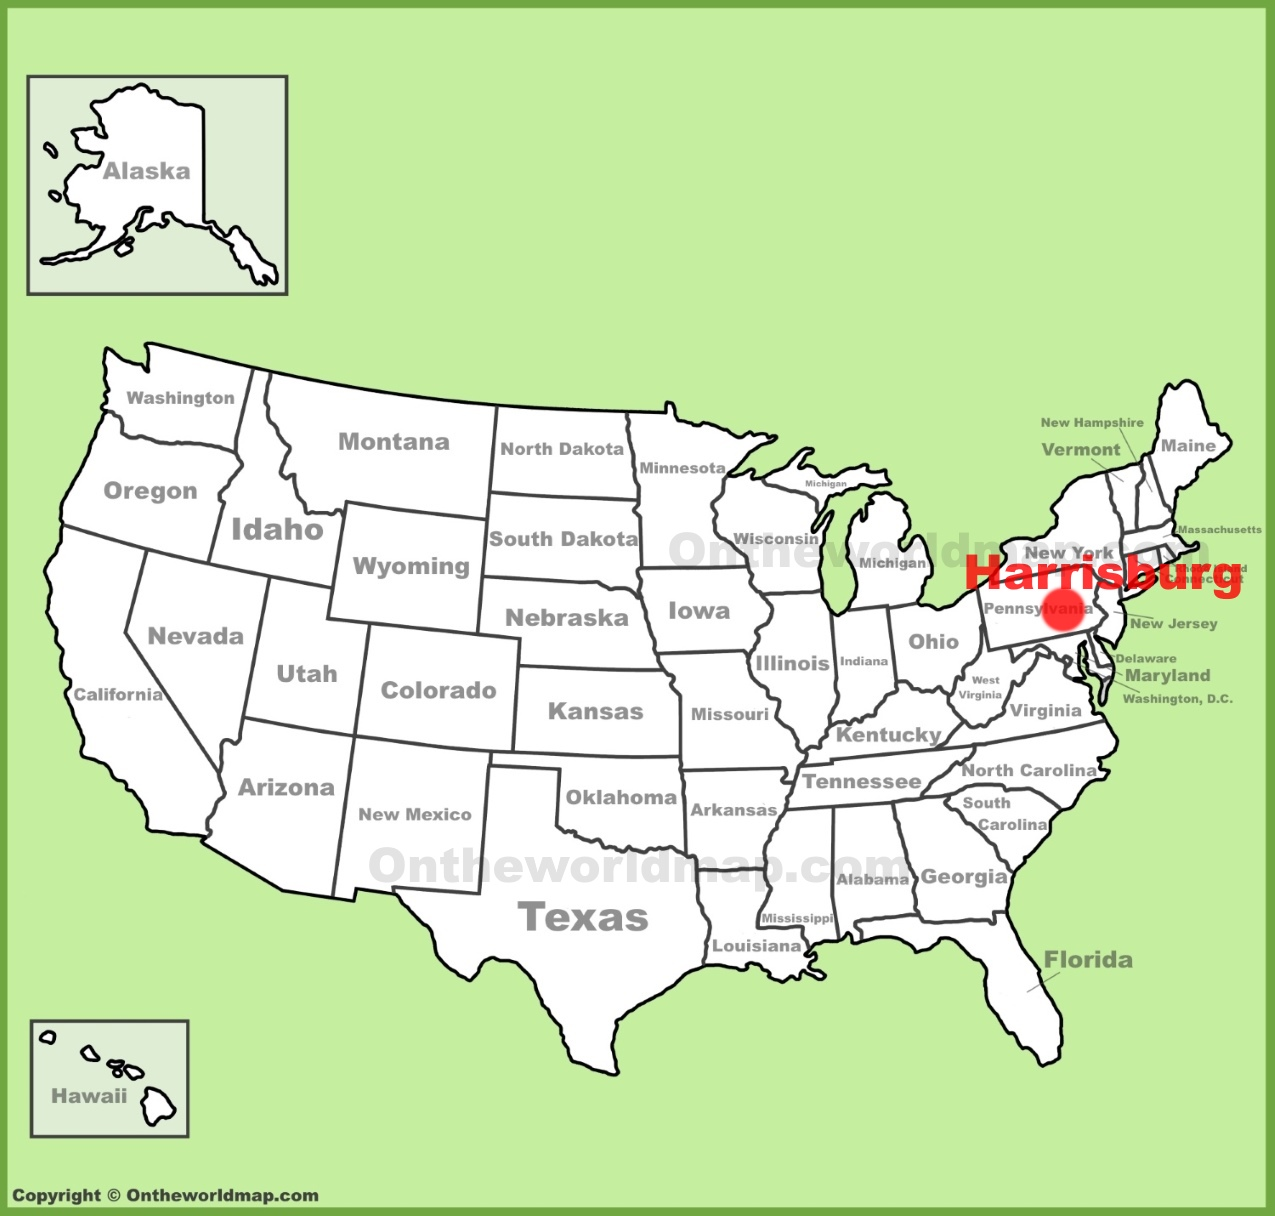 Harrisburg Maps Pennsylvania US Maps of Harrisburg